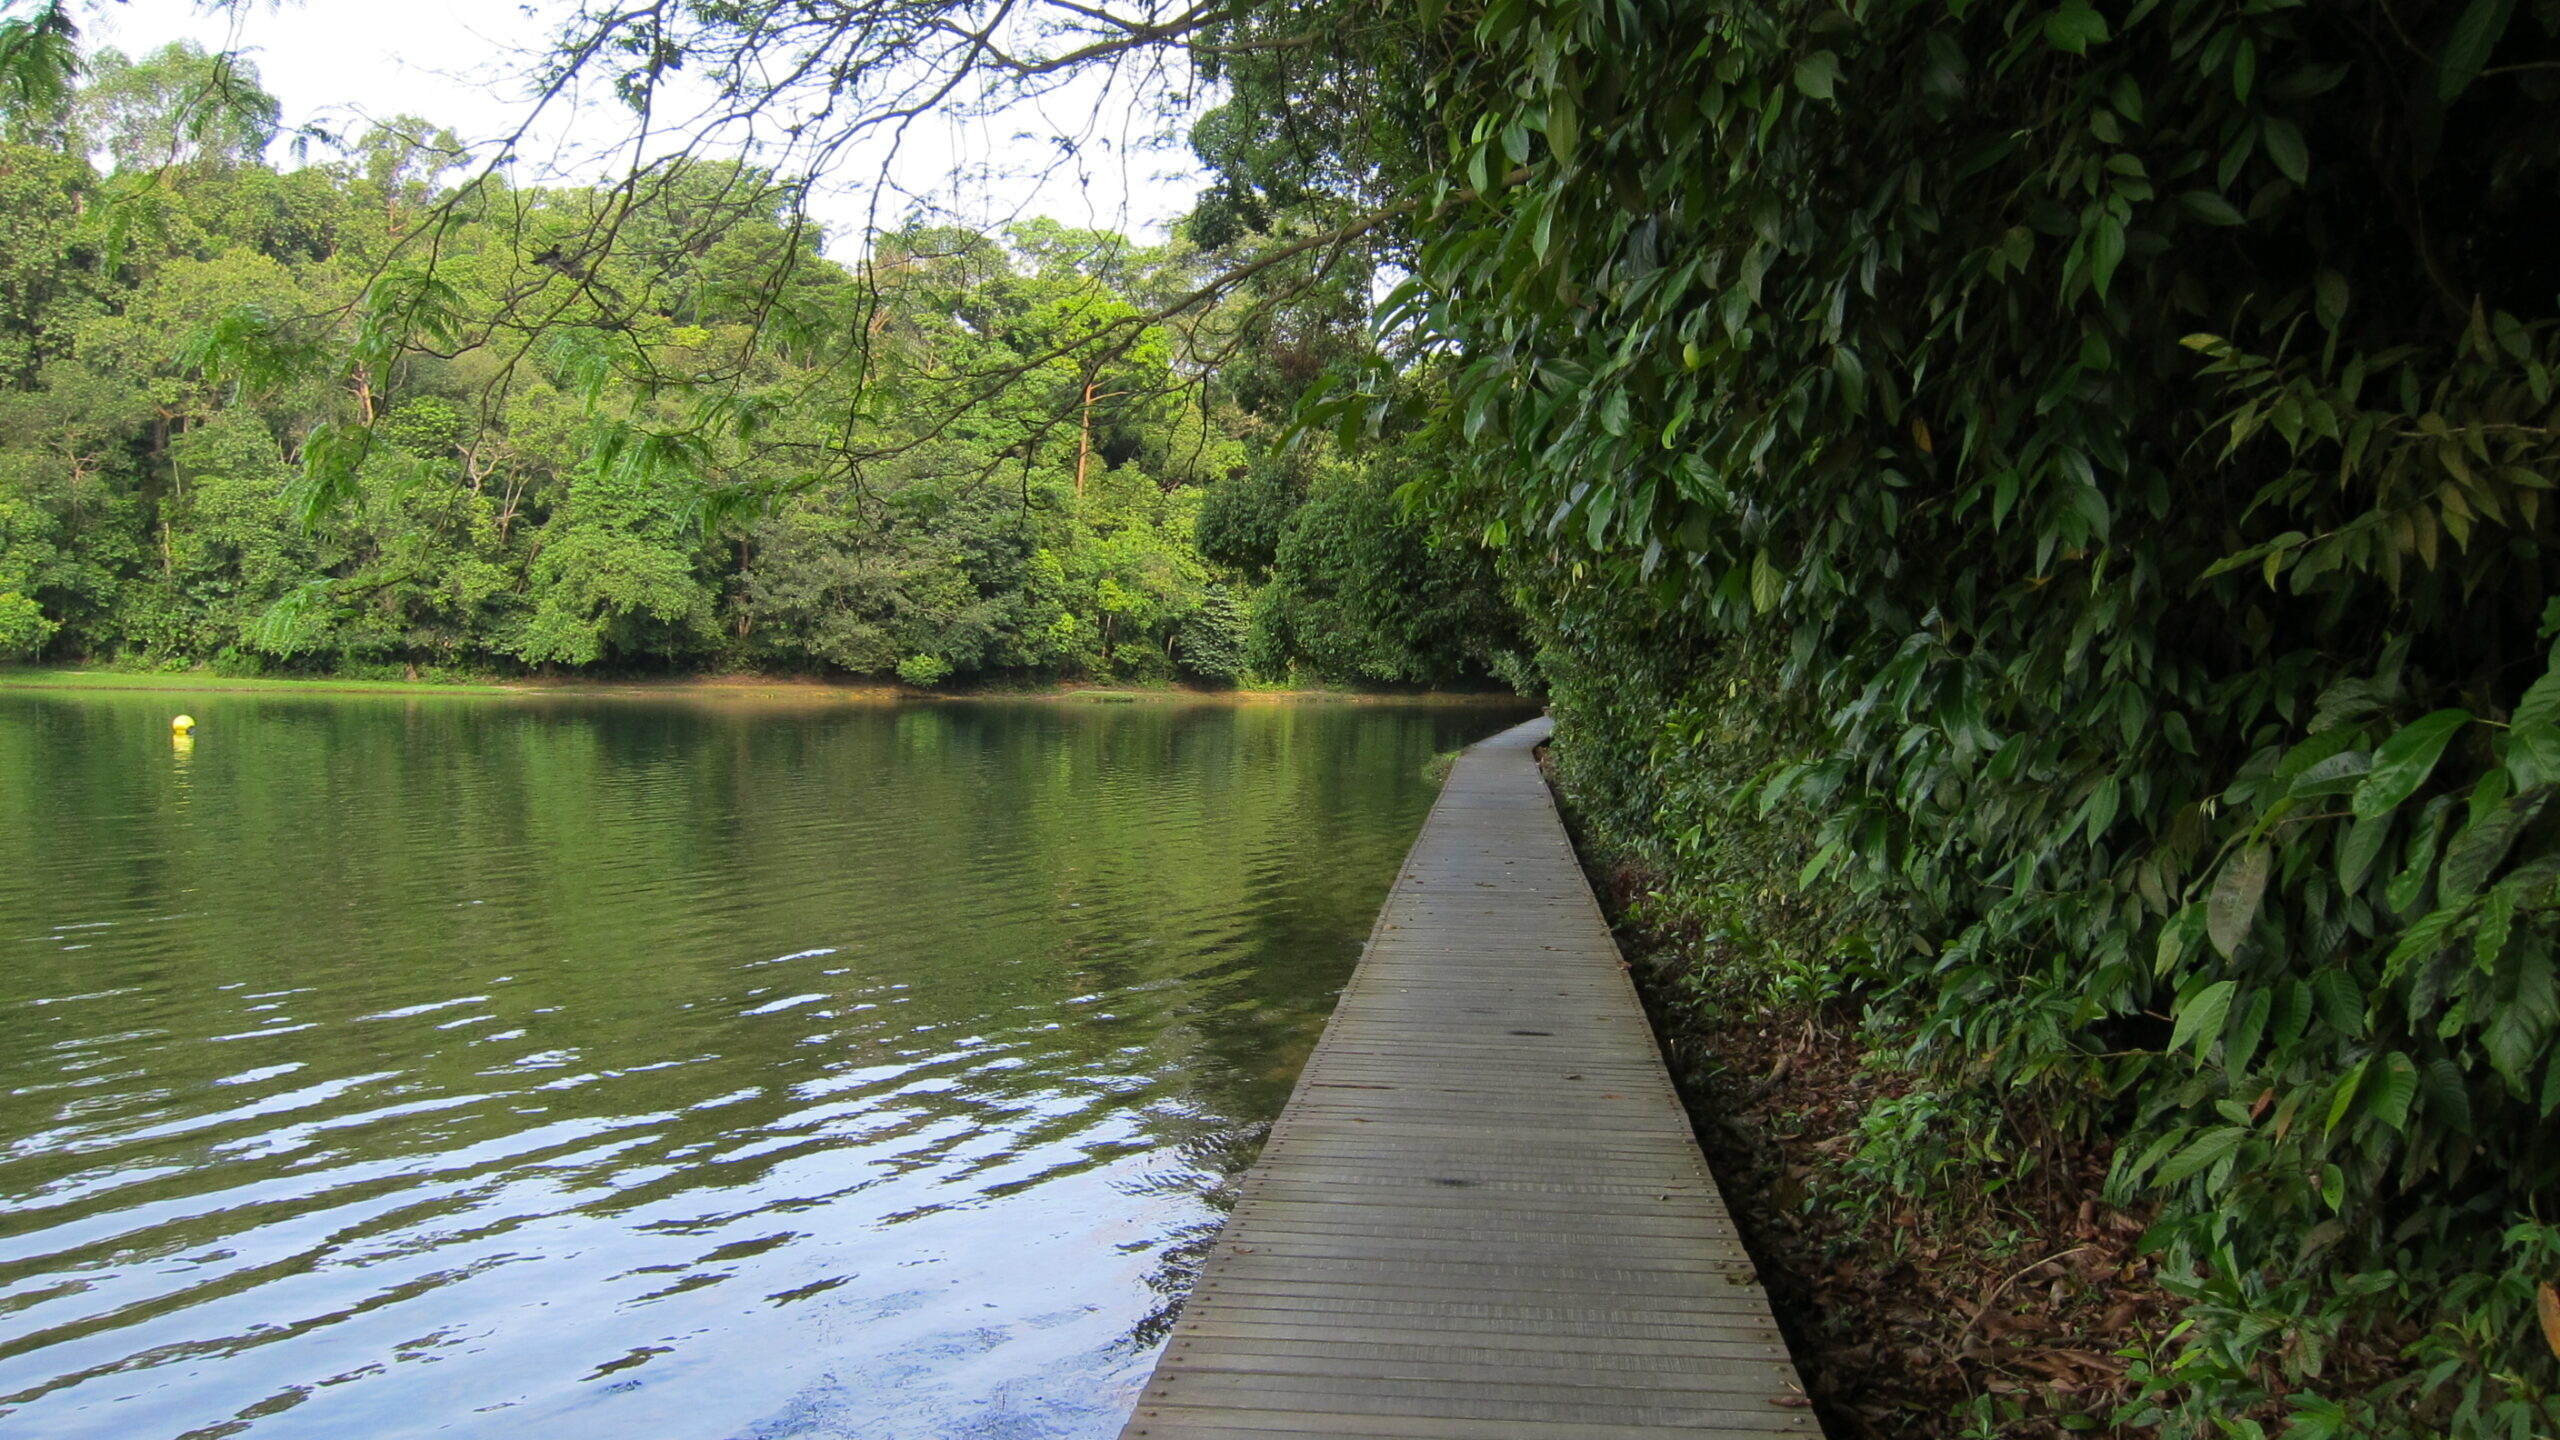 MacRitchie_Reservoir_Park_-_panoramio_(14)